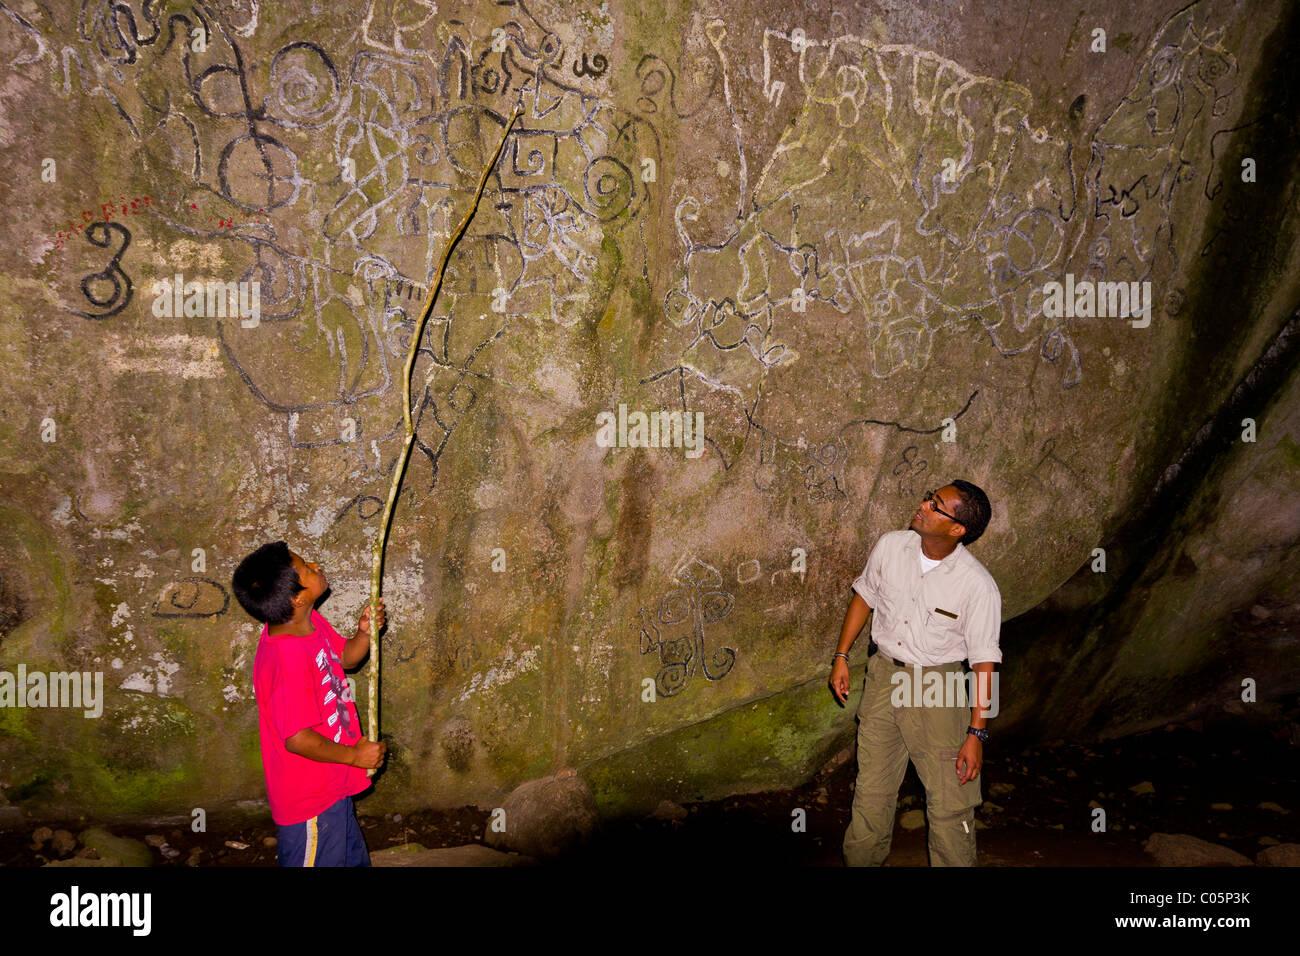 EL VALLE de ANTON, PANAMA - Petroglyphs, indigenous rock art and tour guides, at the Sendero de la Piedra Pintada. - Stock Image